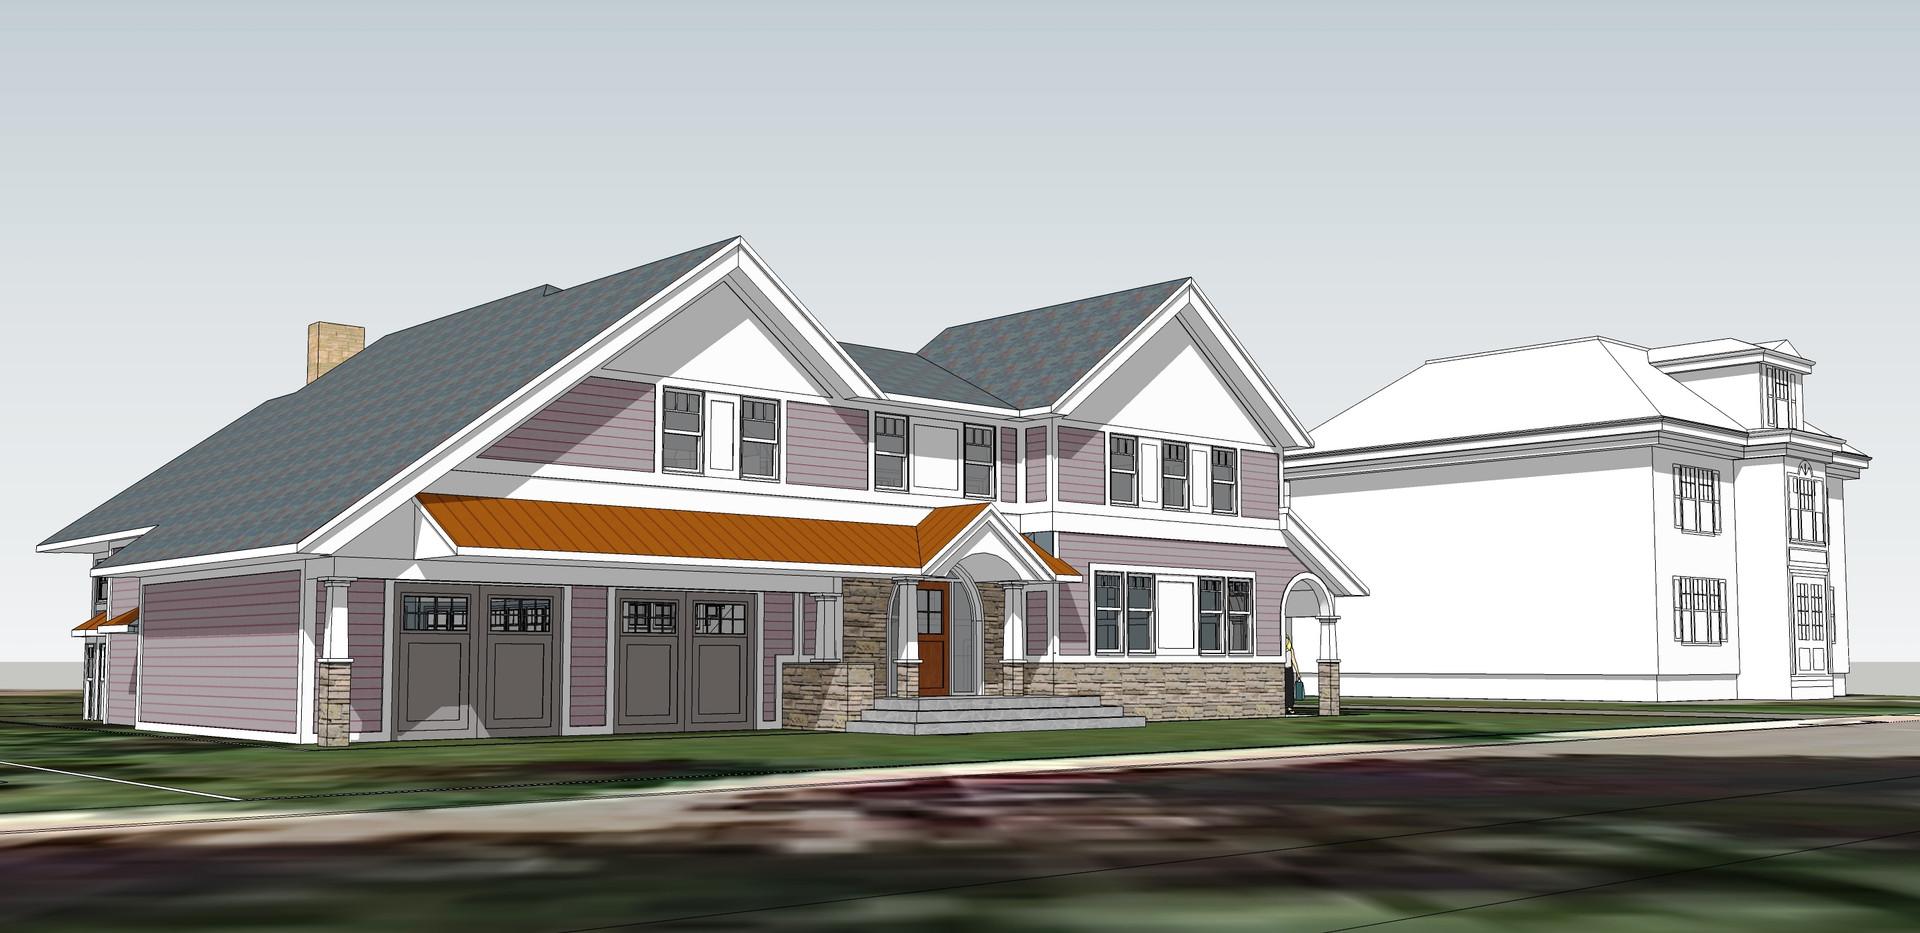 West Roxbury House Proposal